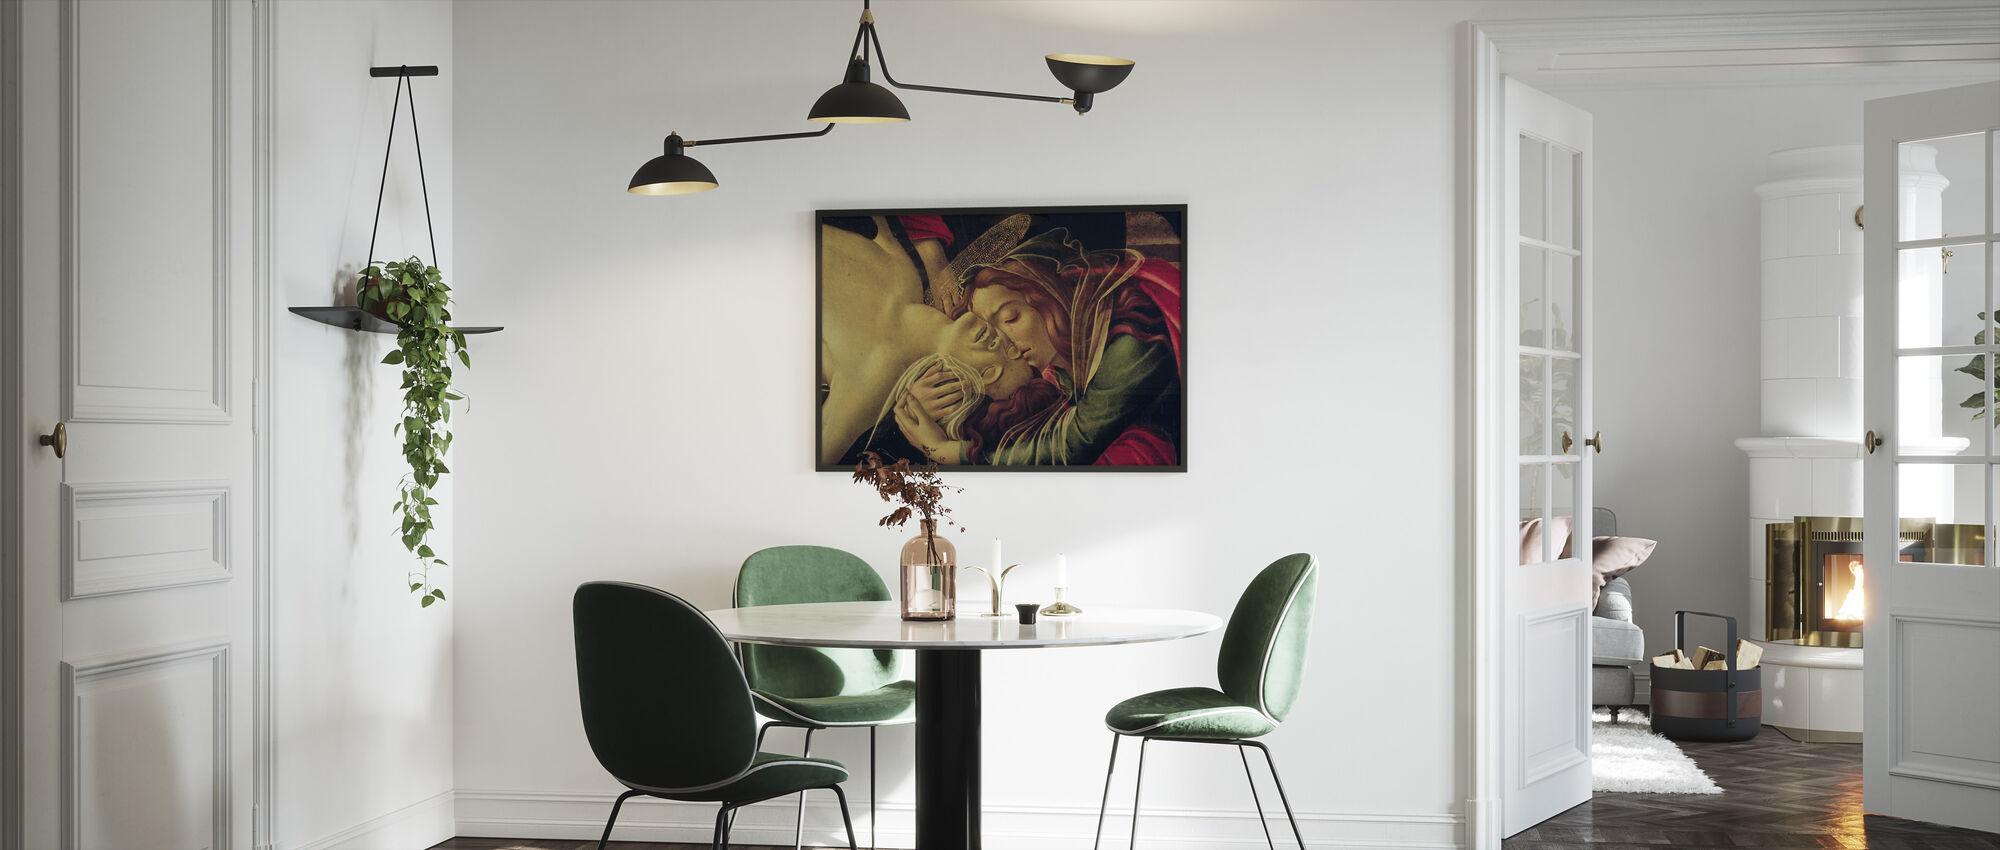 Lamentation of Christ - Sandro Botticelli - Framed print - Kitchen